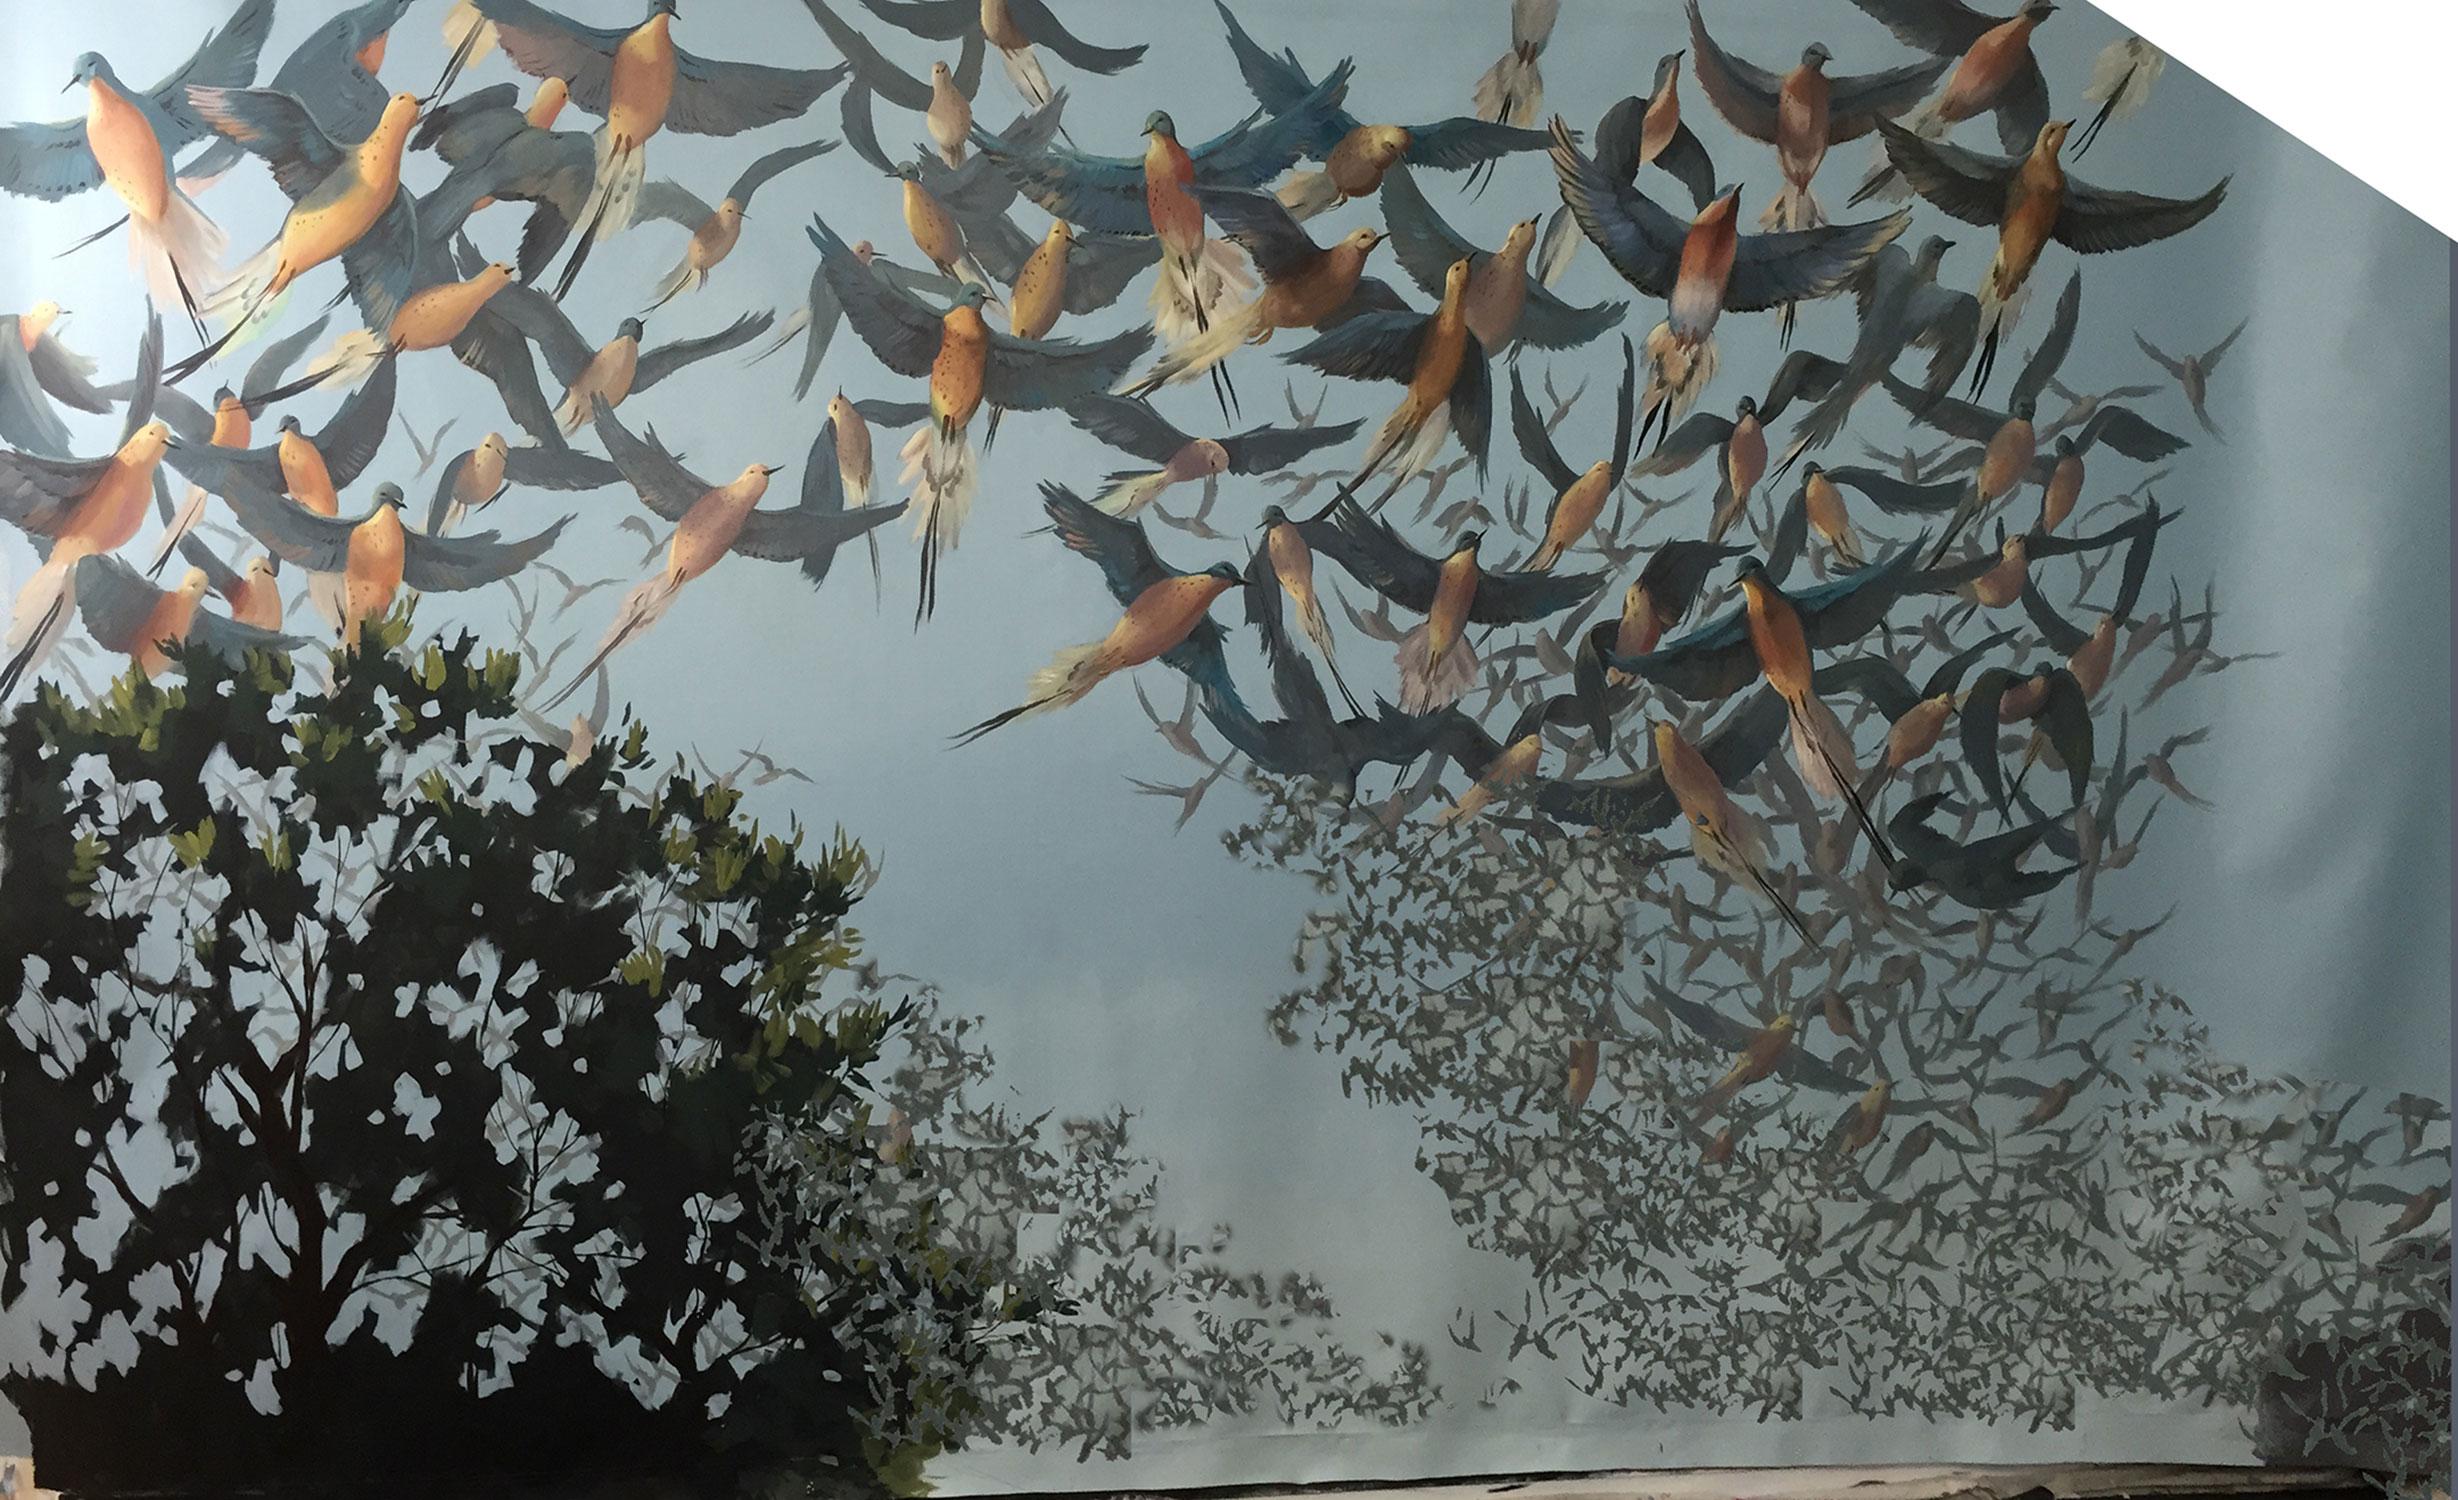 Progress Photo: Paint mural in Los Angeles Studio (top 1/2 of mural).